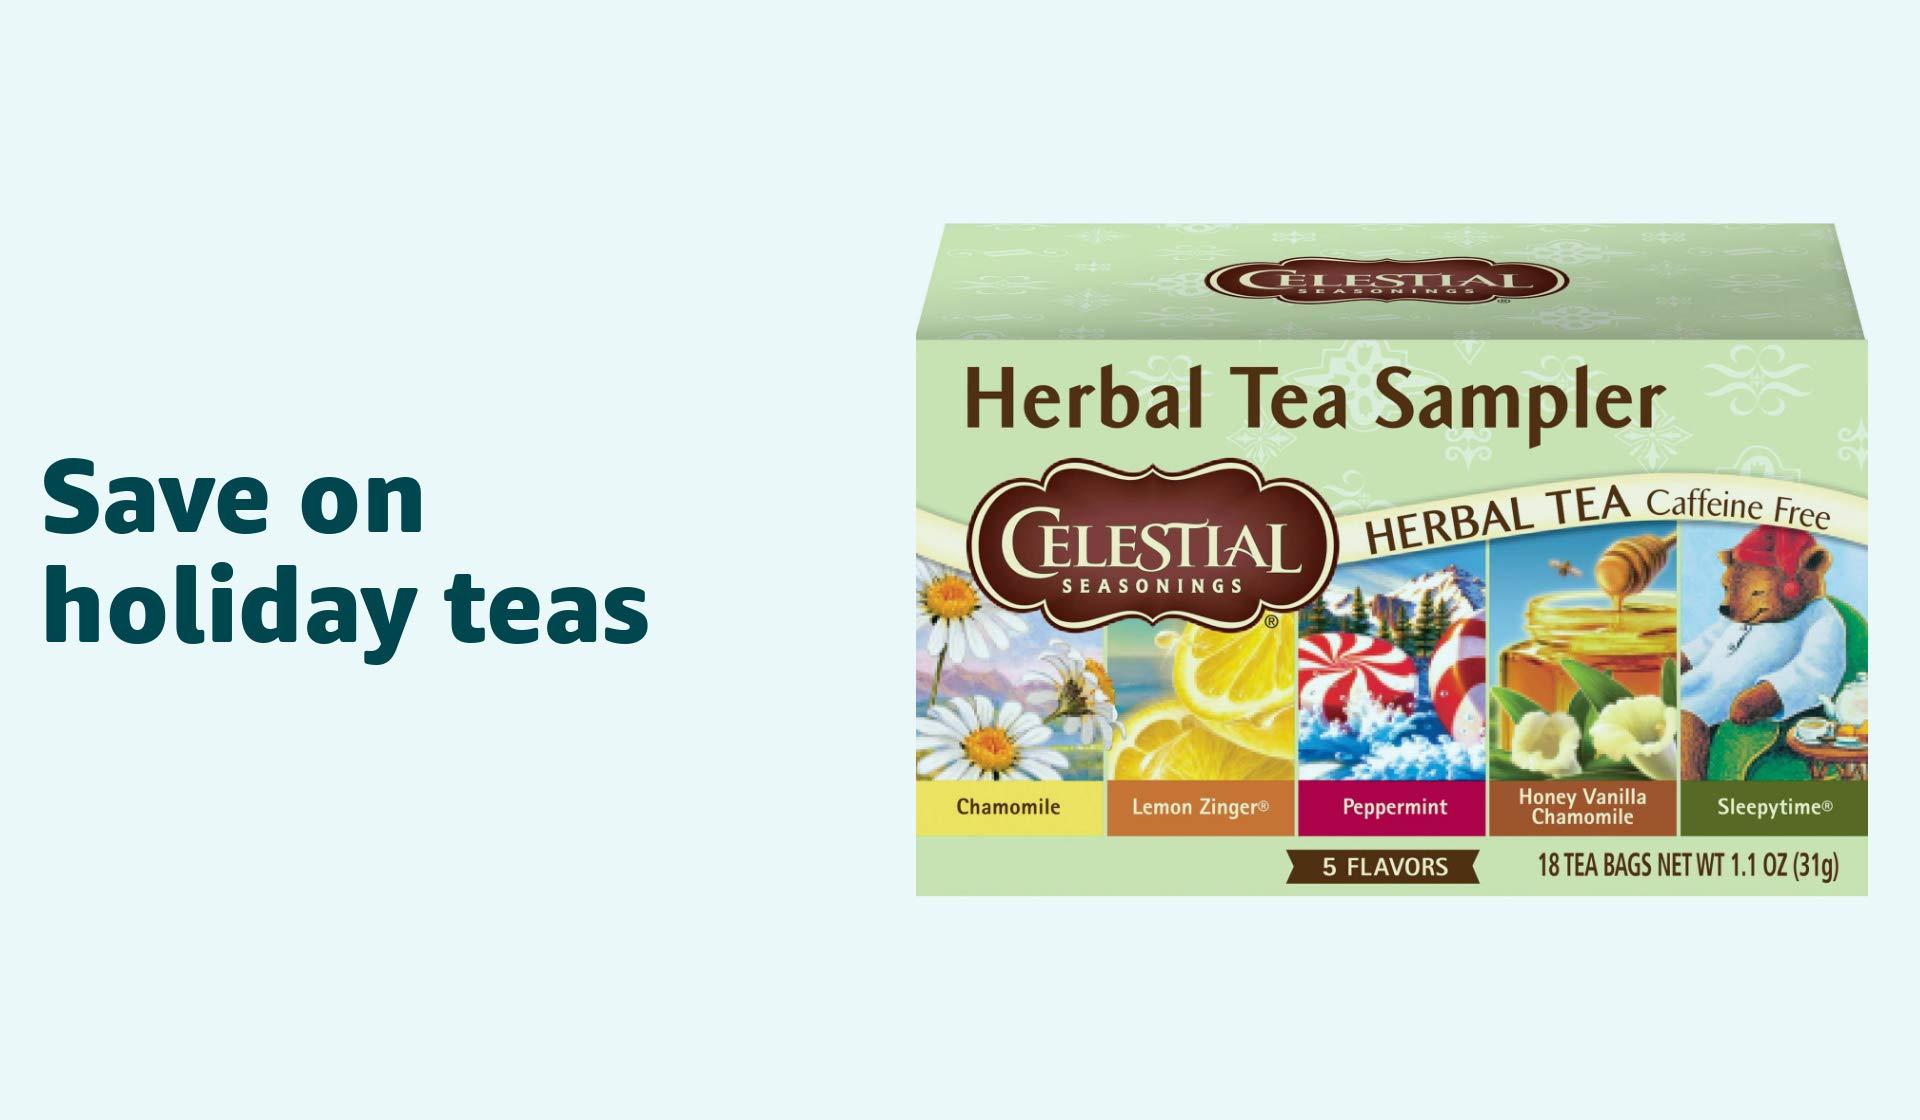 Save on Holiday teas